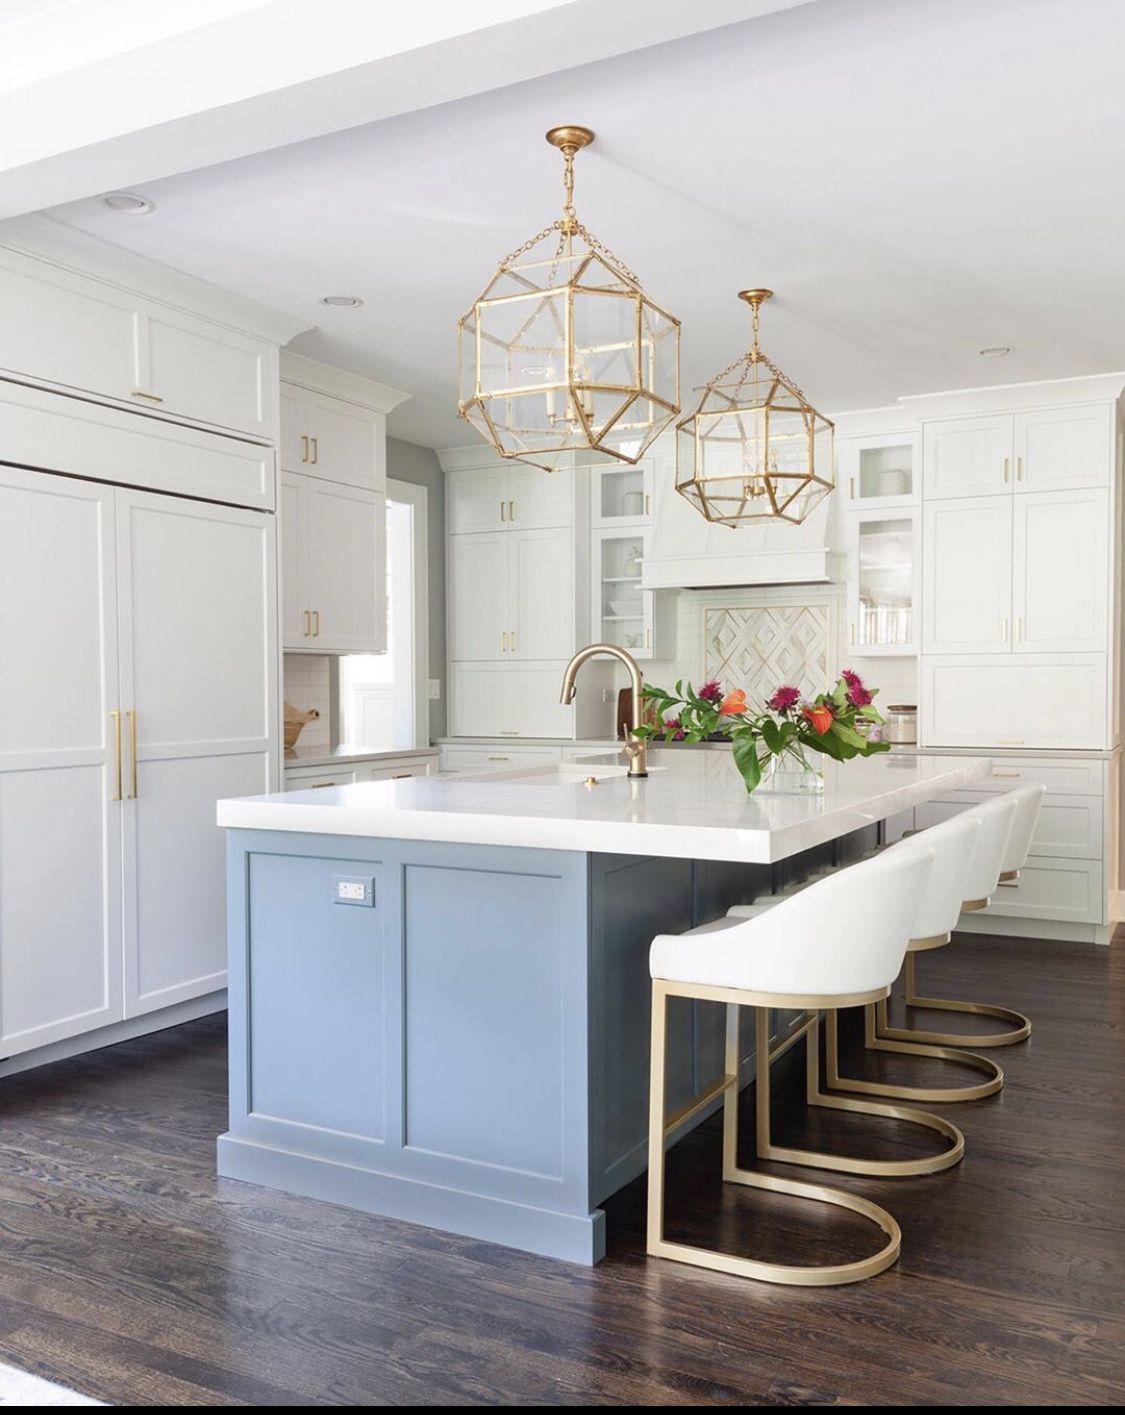 Pin By Caroll Interiors On Hillary Matts House In 2020 Transitional Kitchen Design Kitchen Design Modern Kitchen